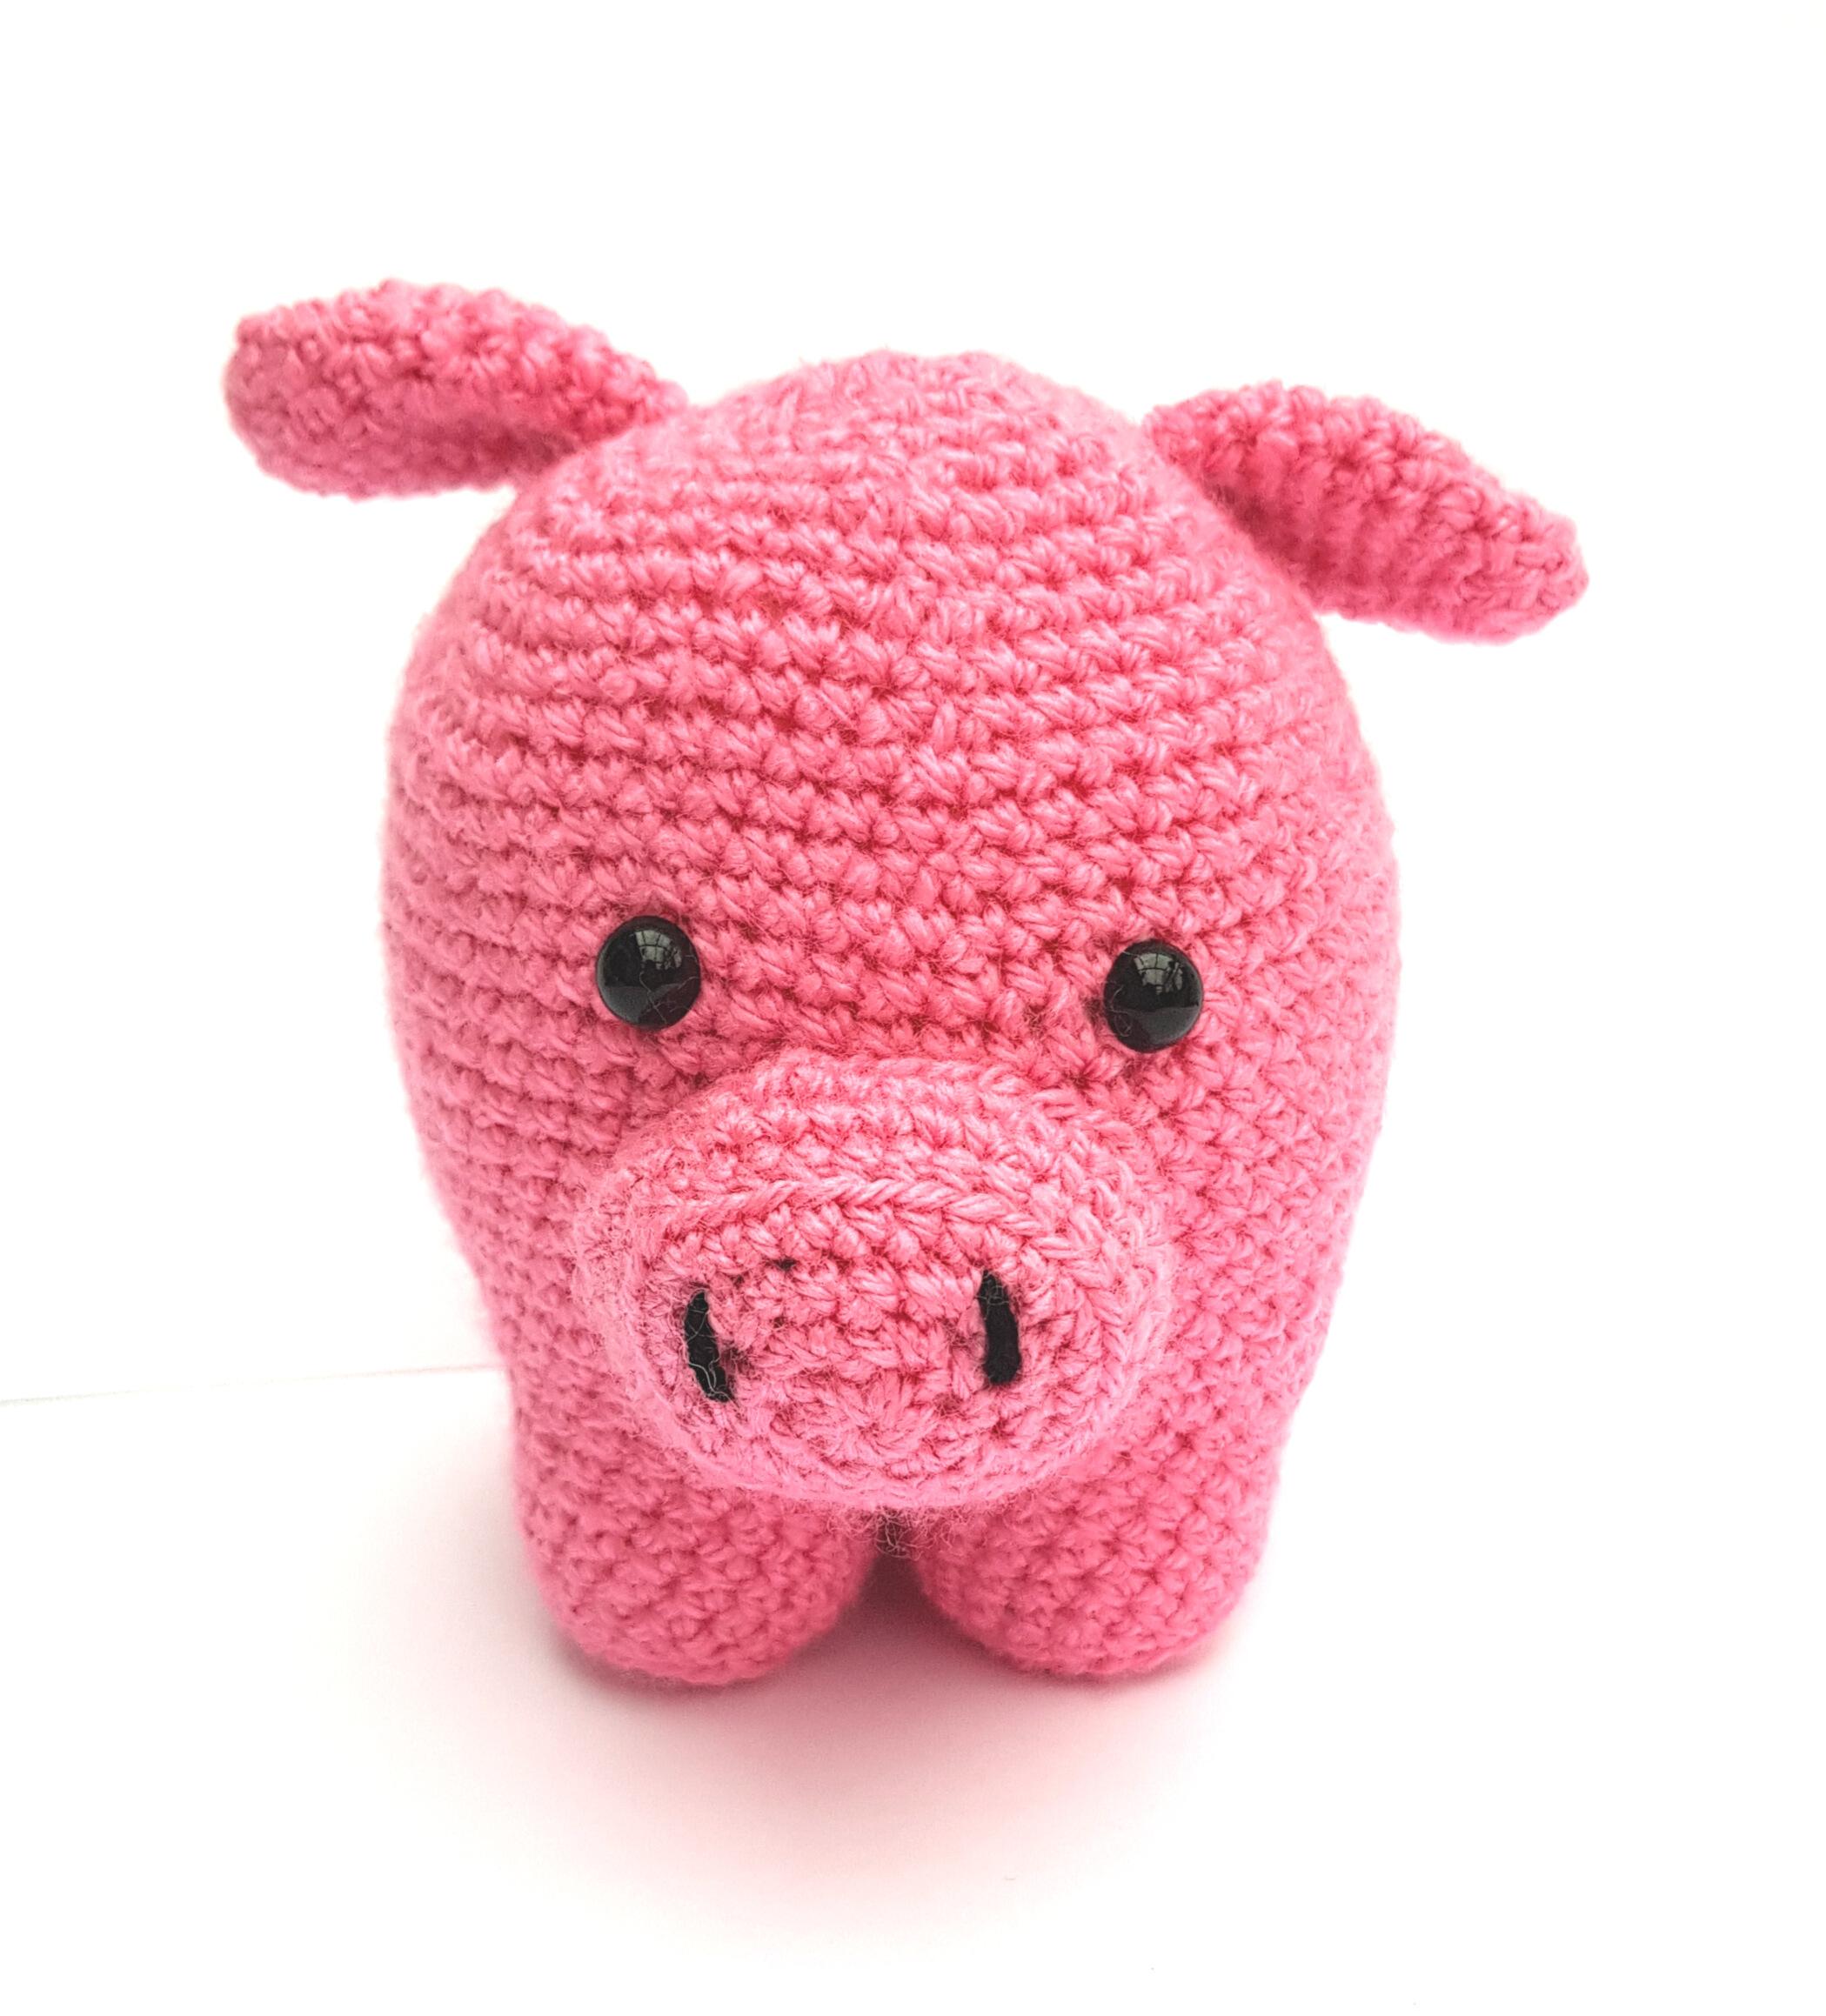 Puffy Pals Amigurumi Crochet Pattern (Easy Crochet Doll Patterns ... | 2318x2099